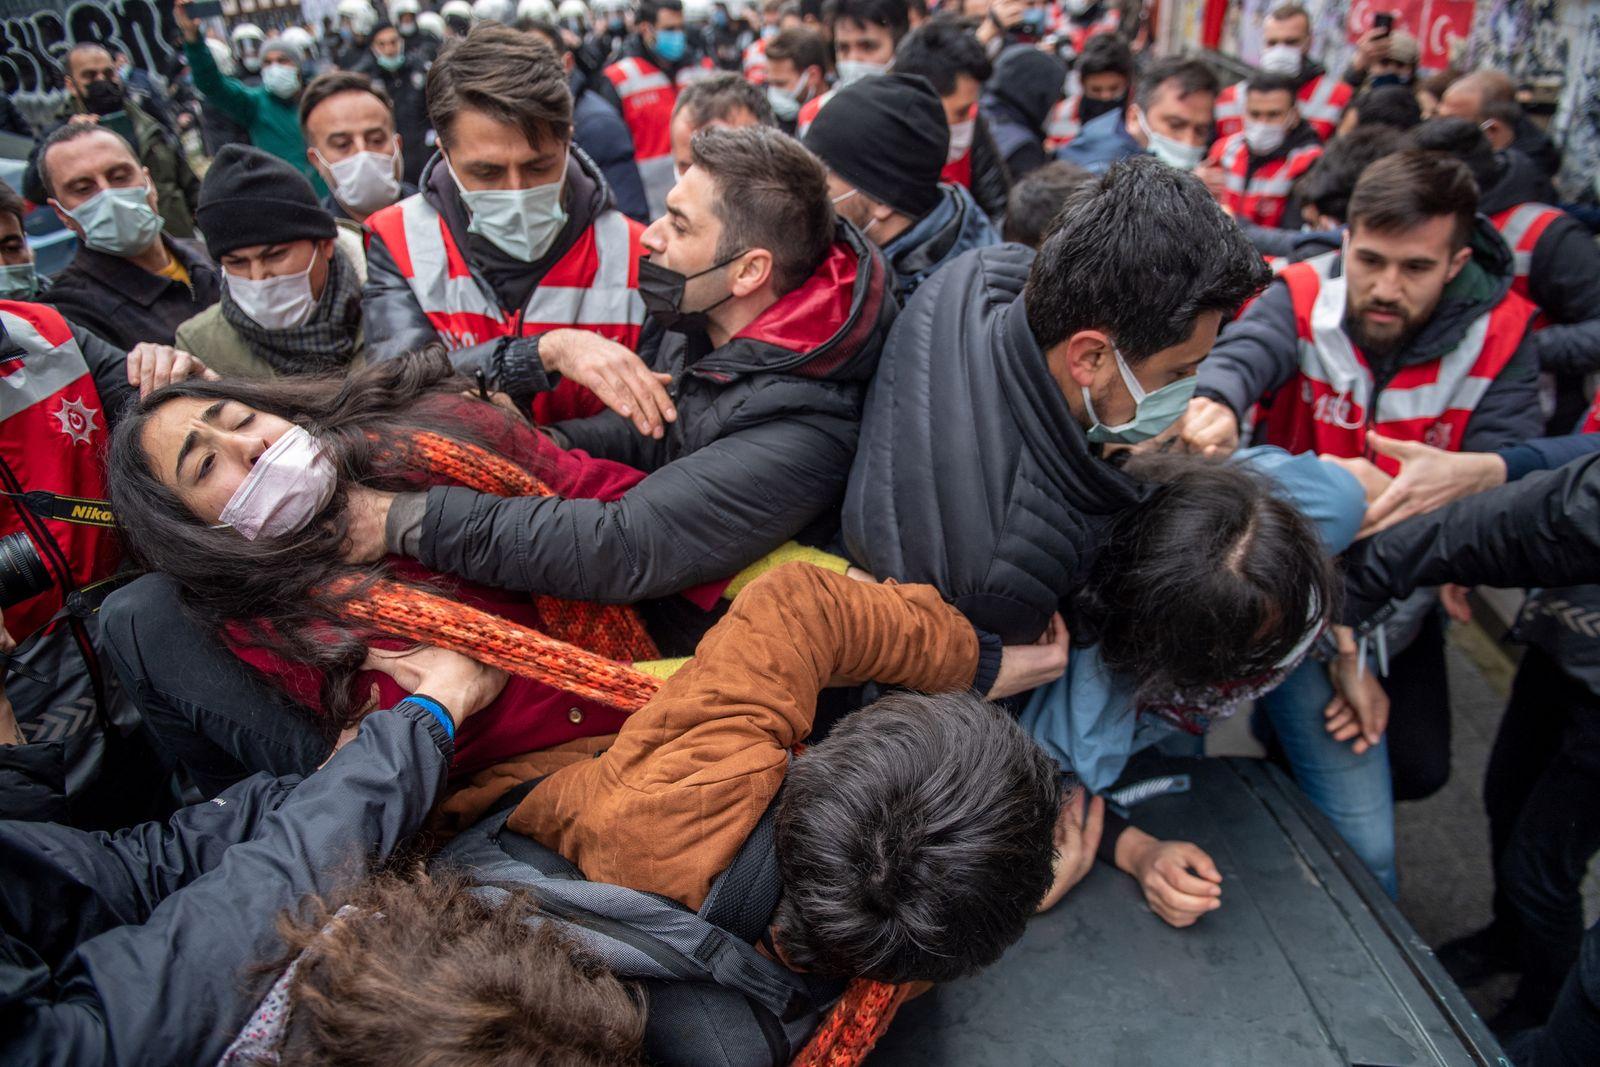 TURKEY-EDUCATION-POLITICS-PROTEST-STUDENTS